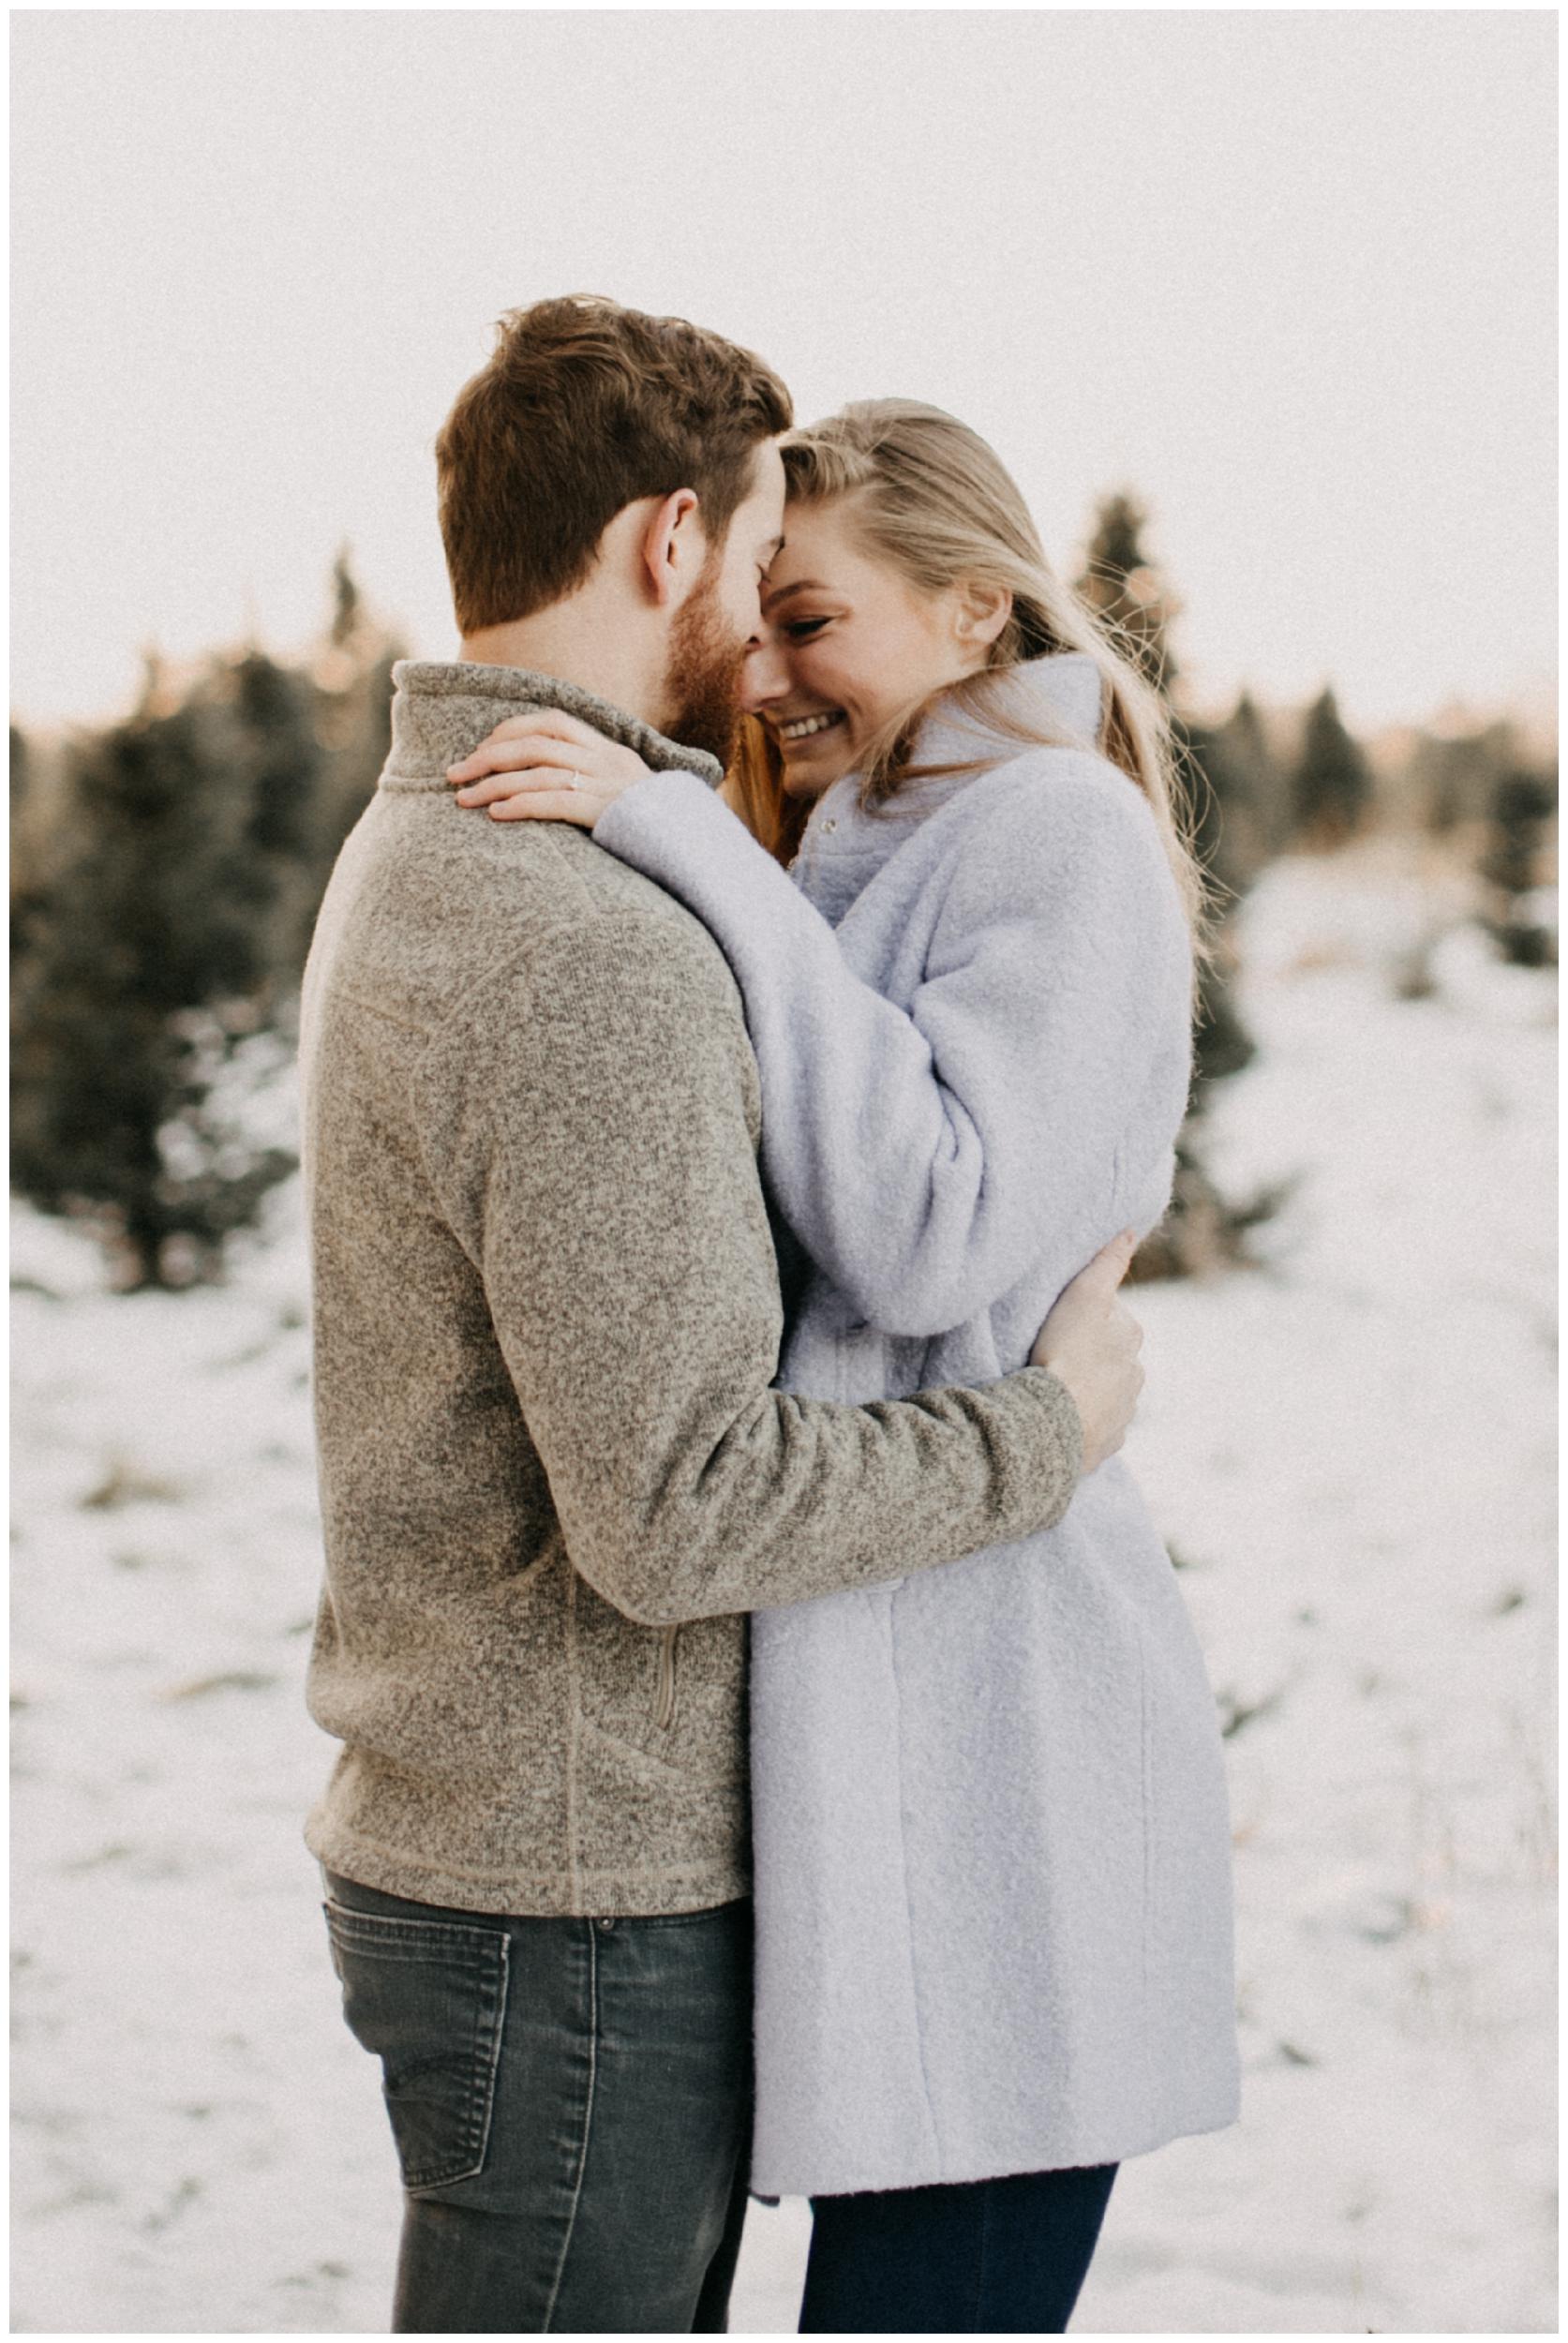 Cozy, outdoor winter engagement session at Hansen Tree farm by Minnesota wedding photographer Britt DeZeeuw